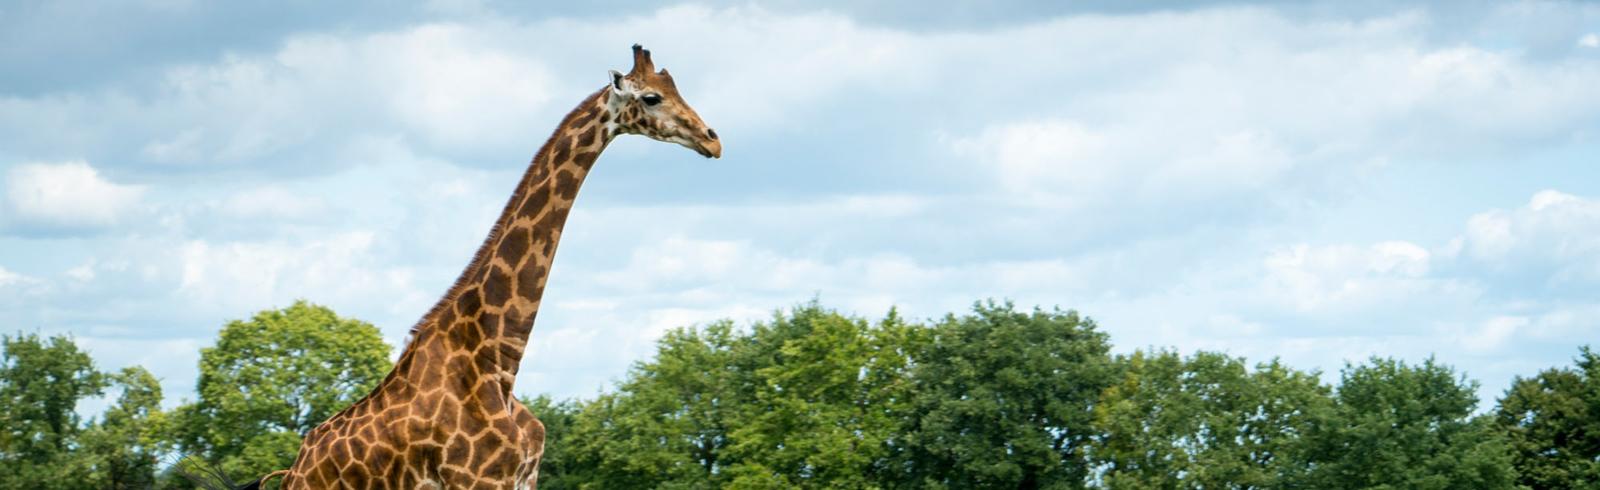 girafe parc sauvage branfere